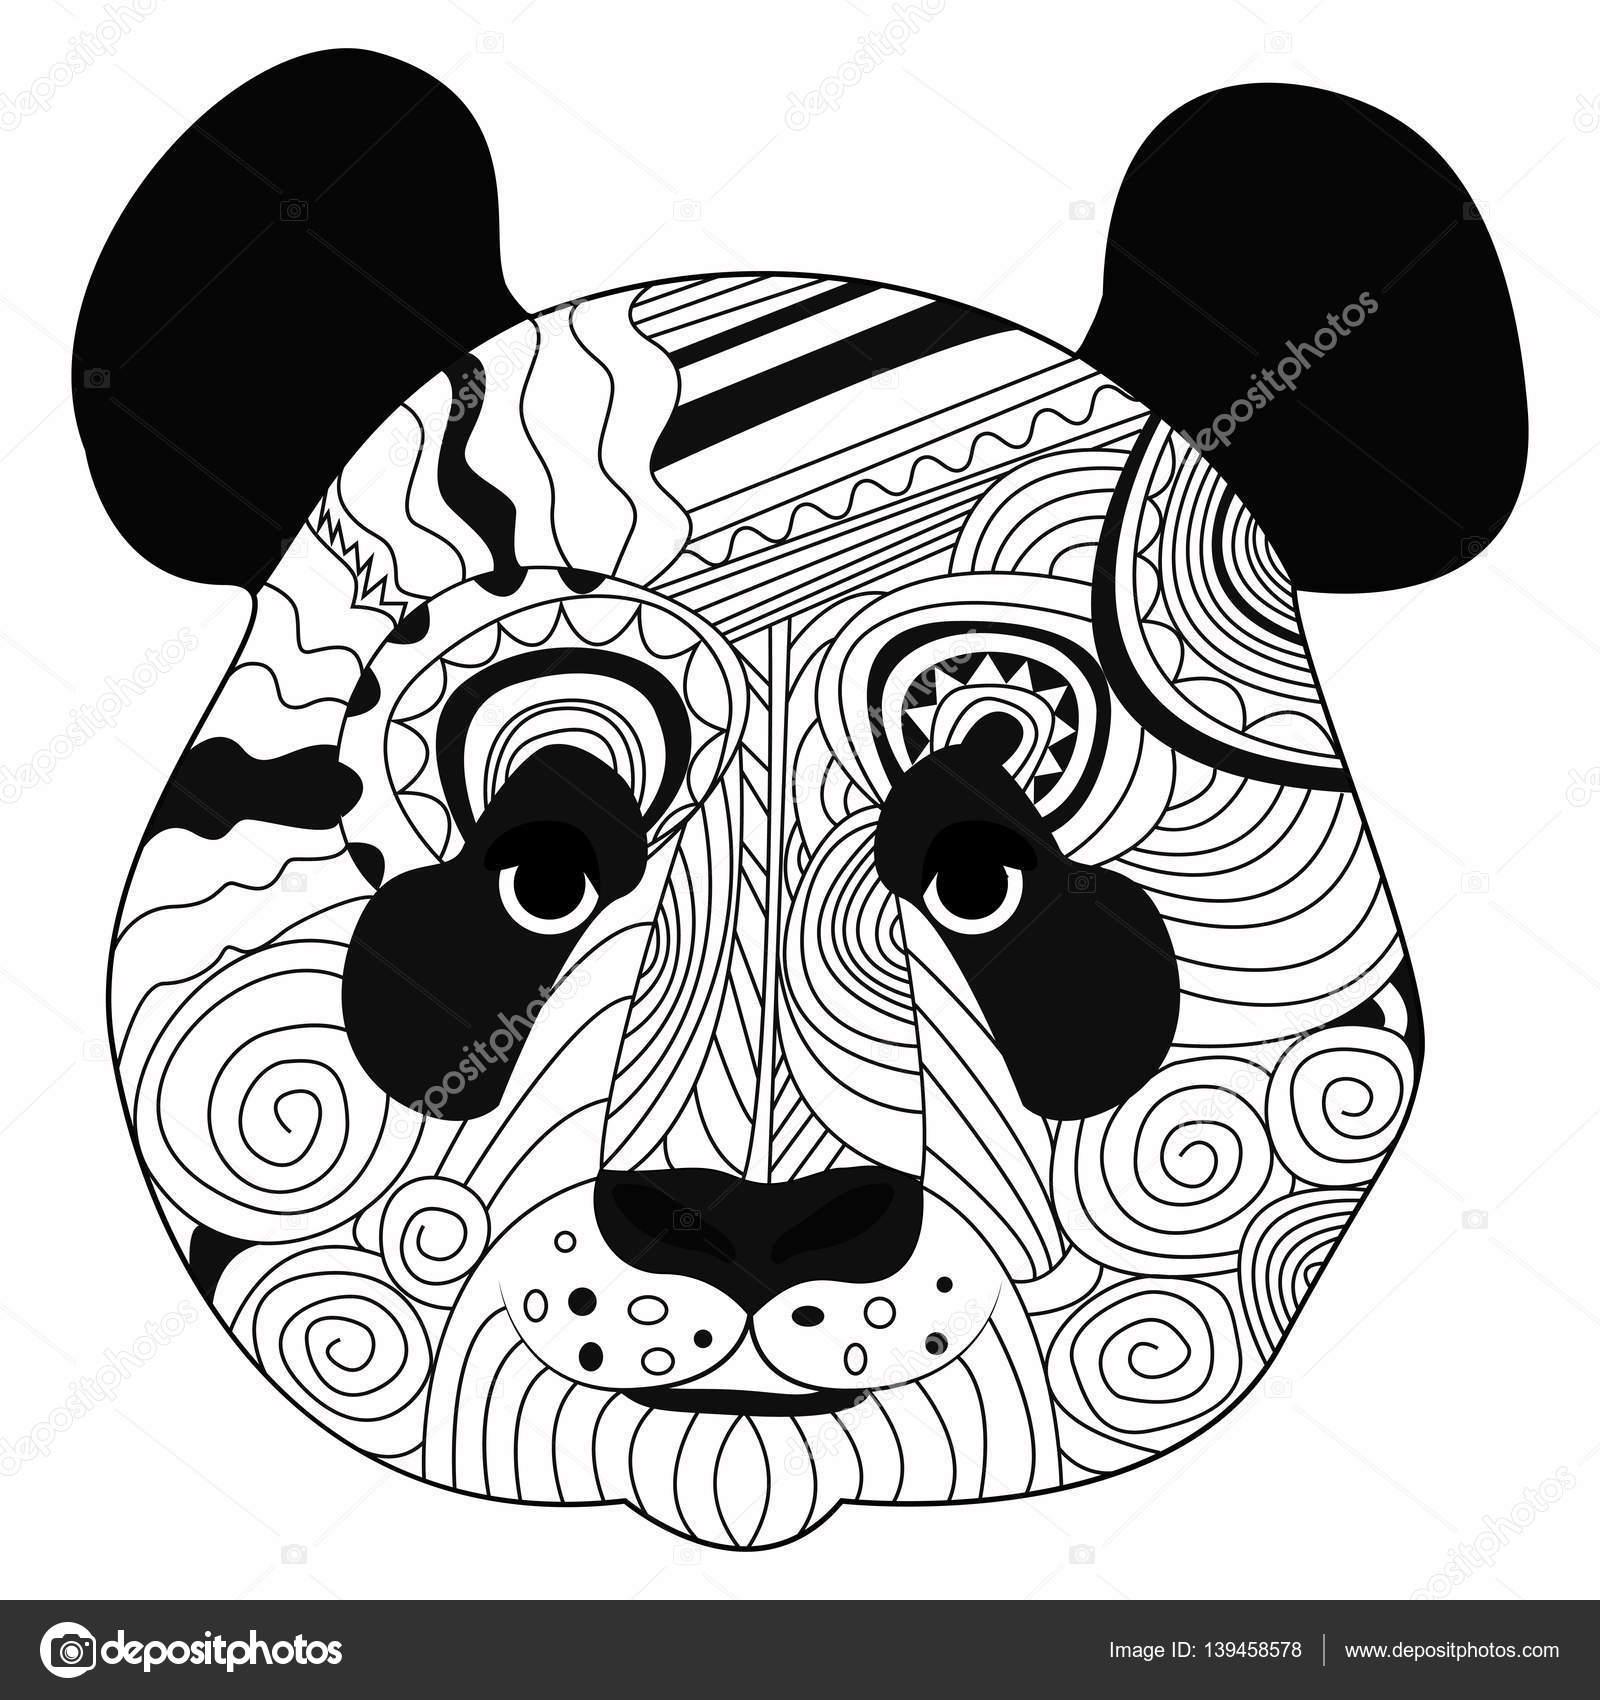 L 237 Nea Arte Mano Dibujo Panda Negro Aislado Sobre Fondo